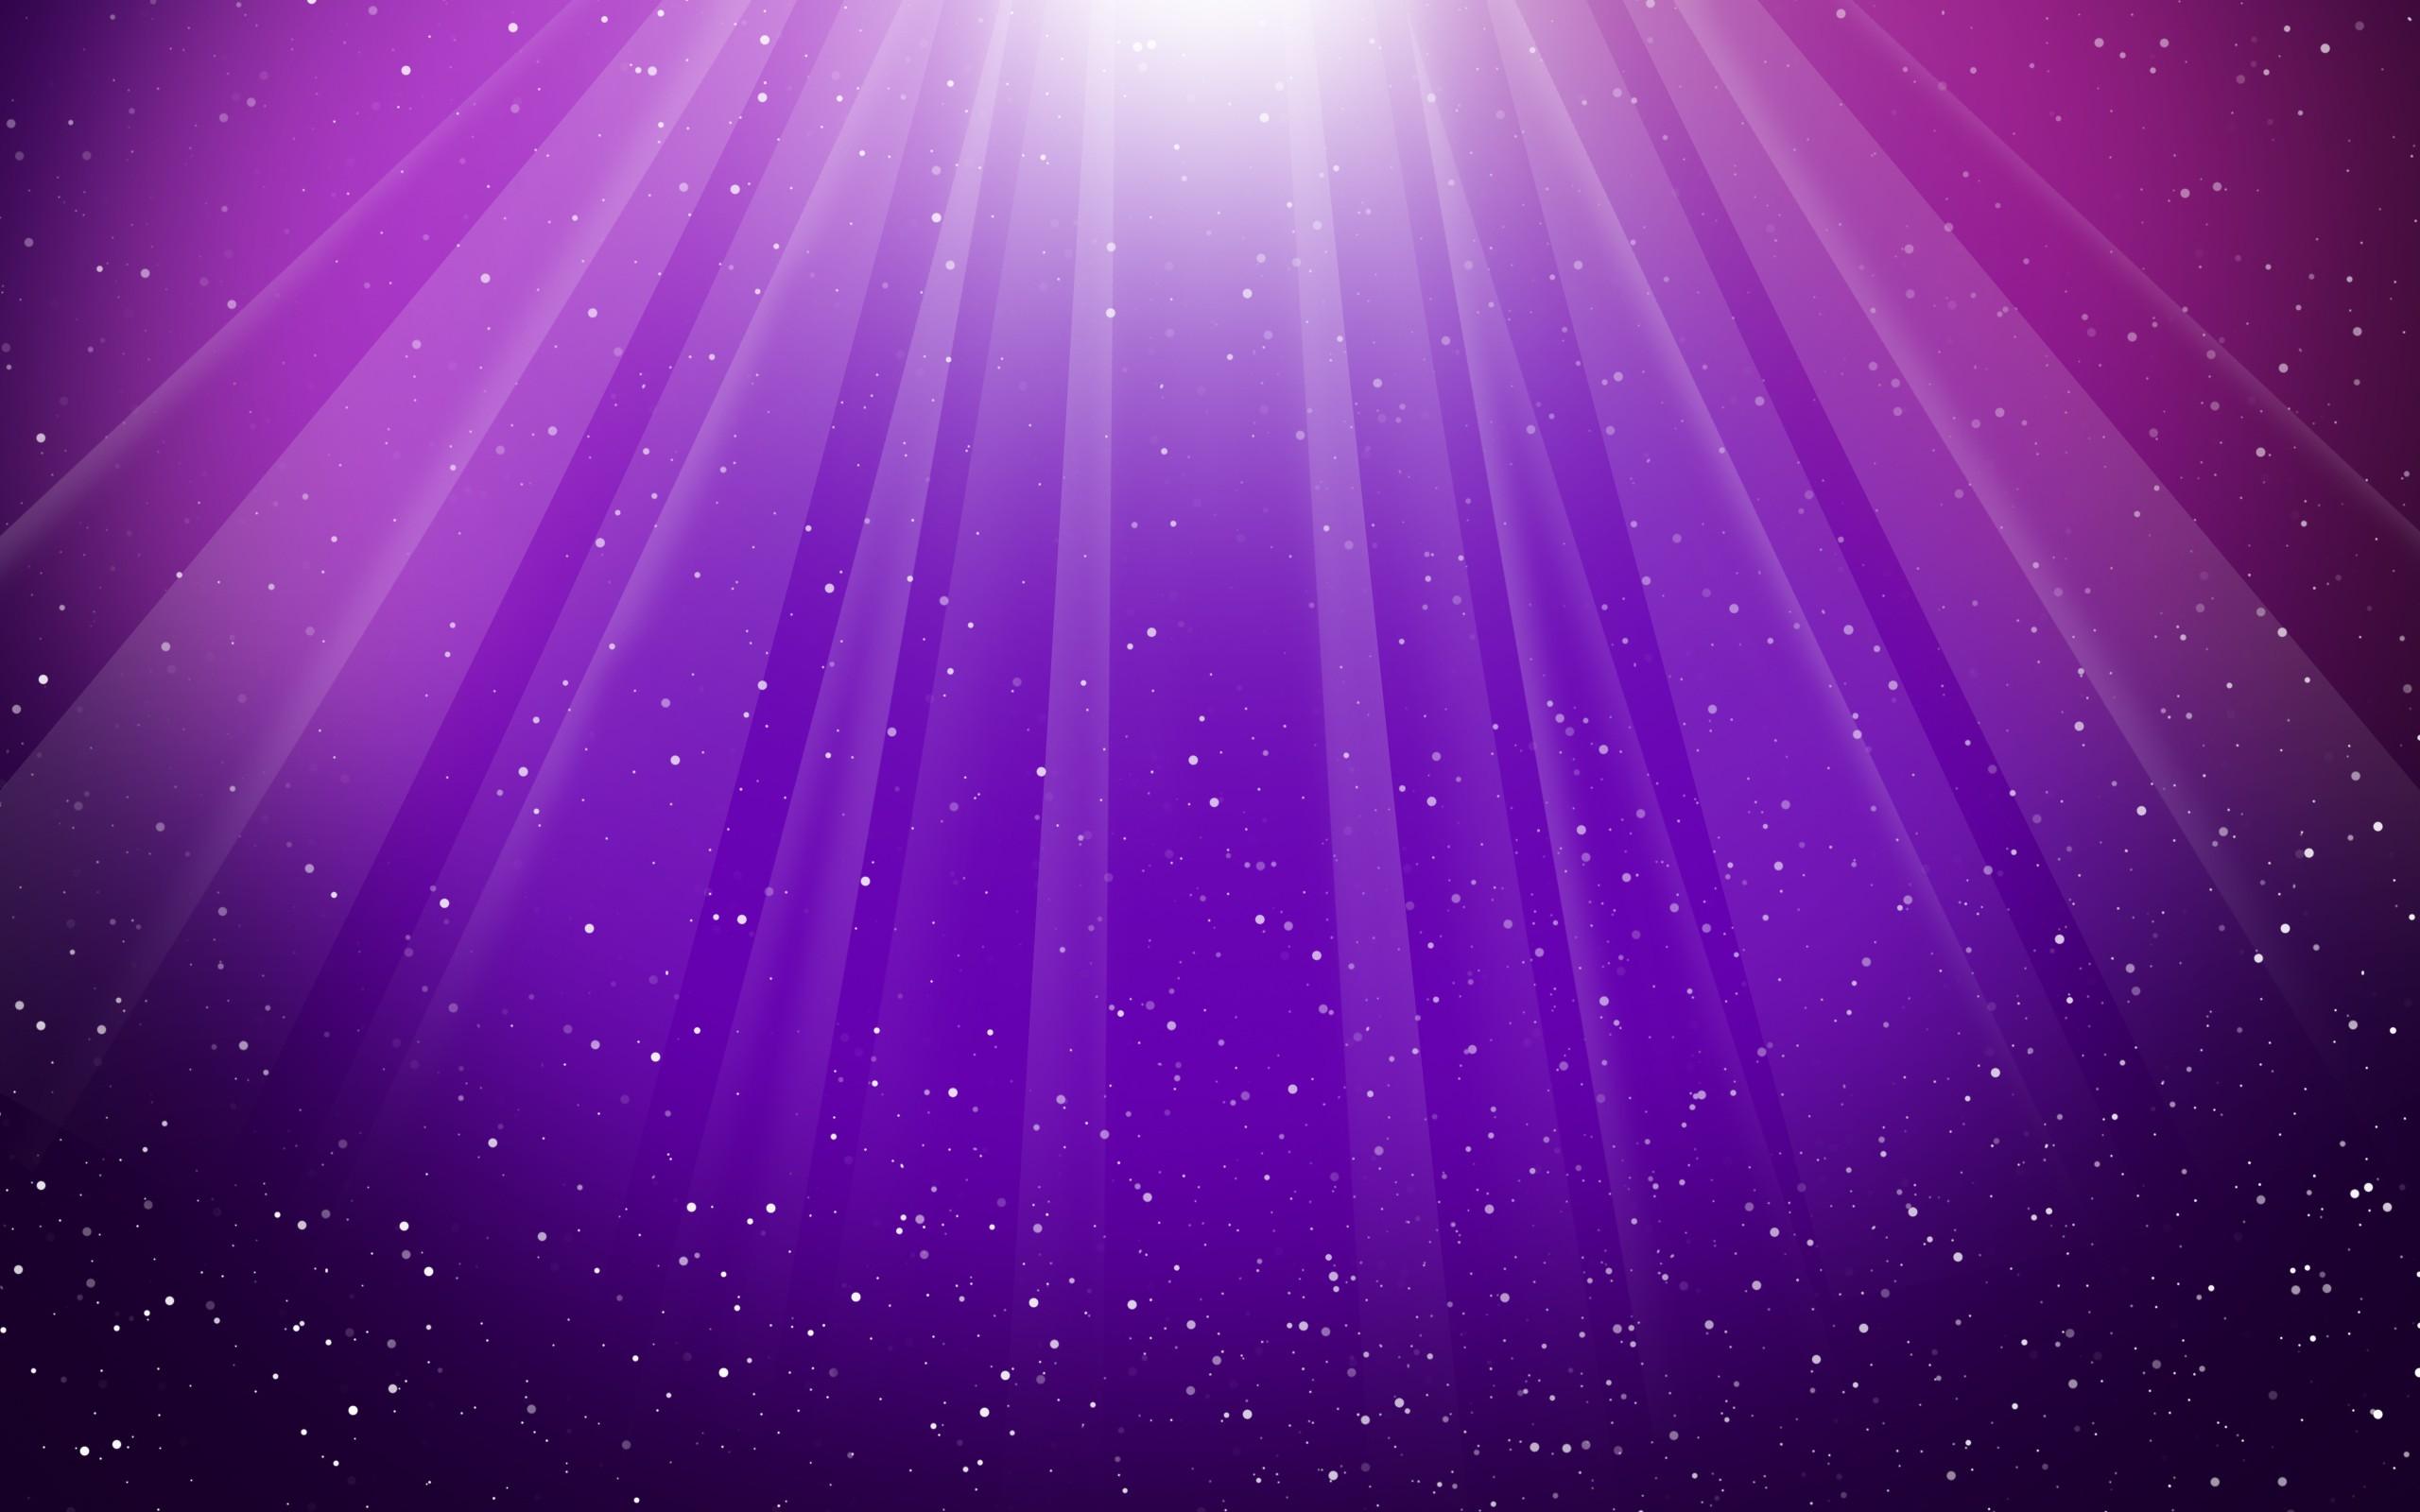 sunlight galaxy space purple stars nebula circle atmosphere lens flare universe astronomy star line screenshot computer